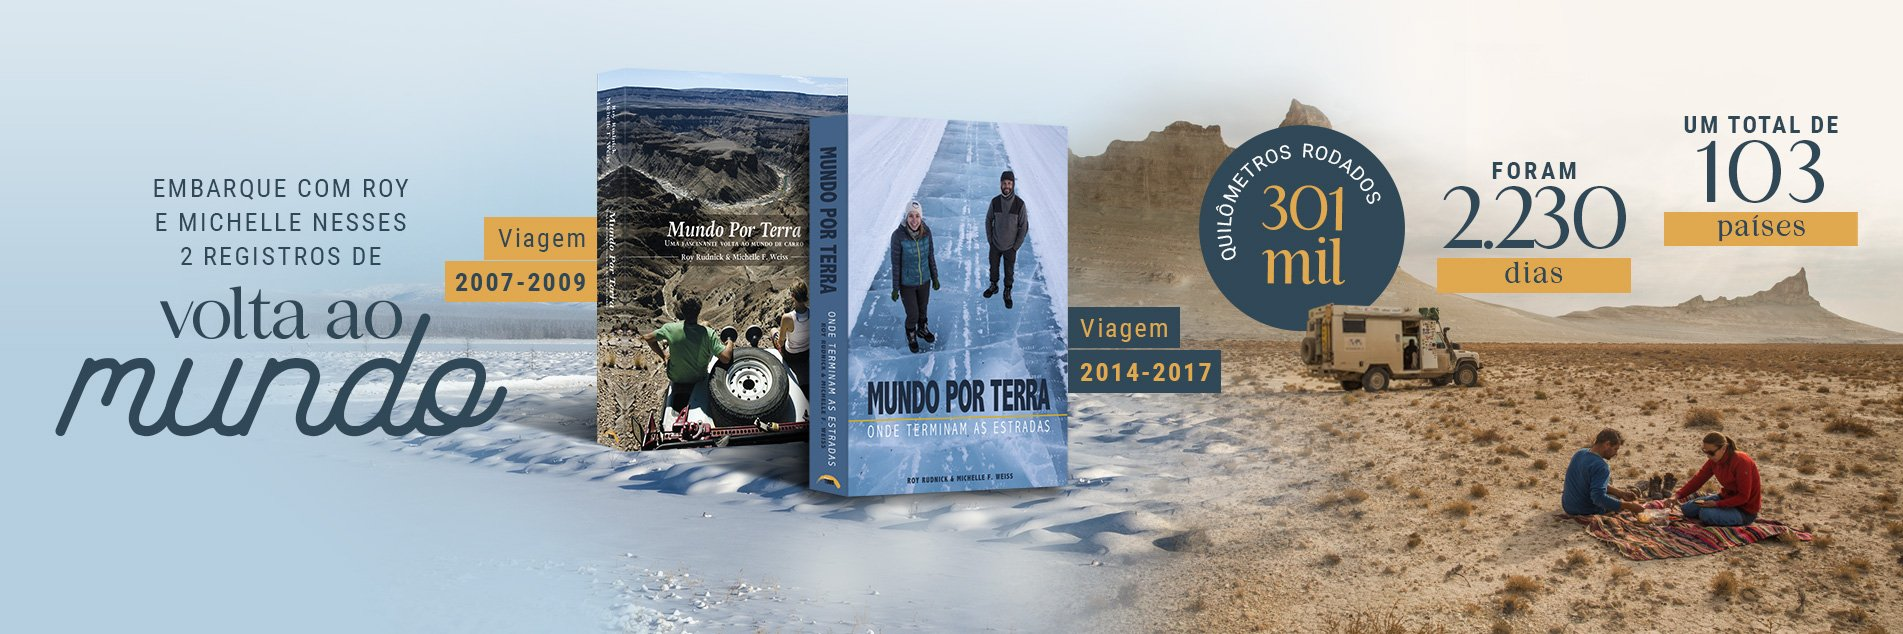 banner 2 livros